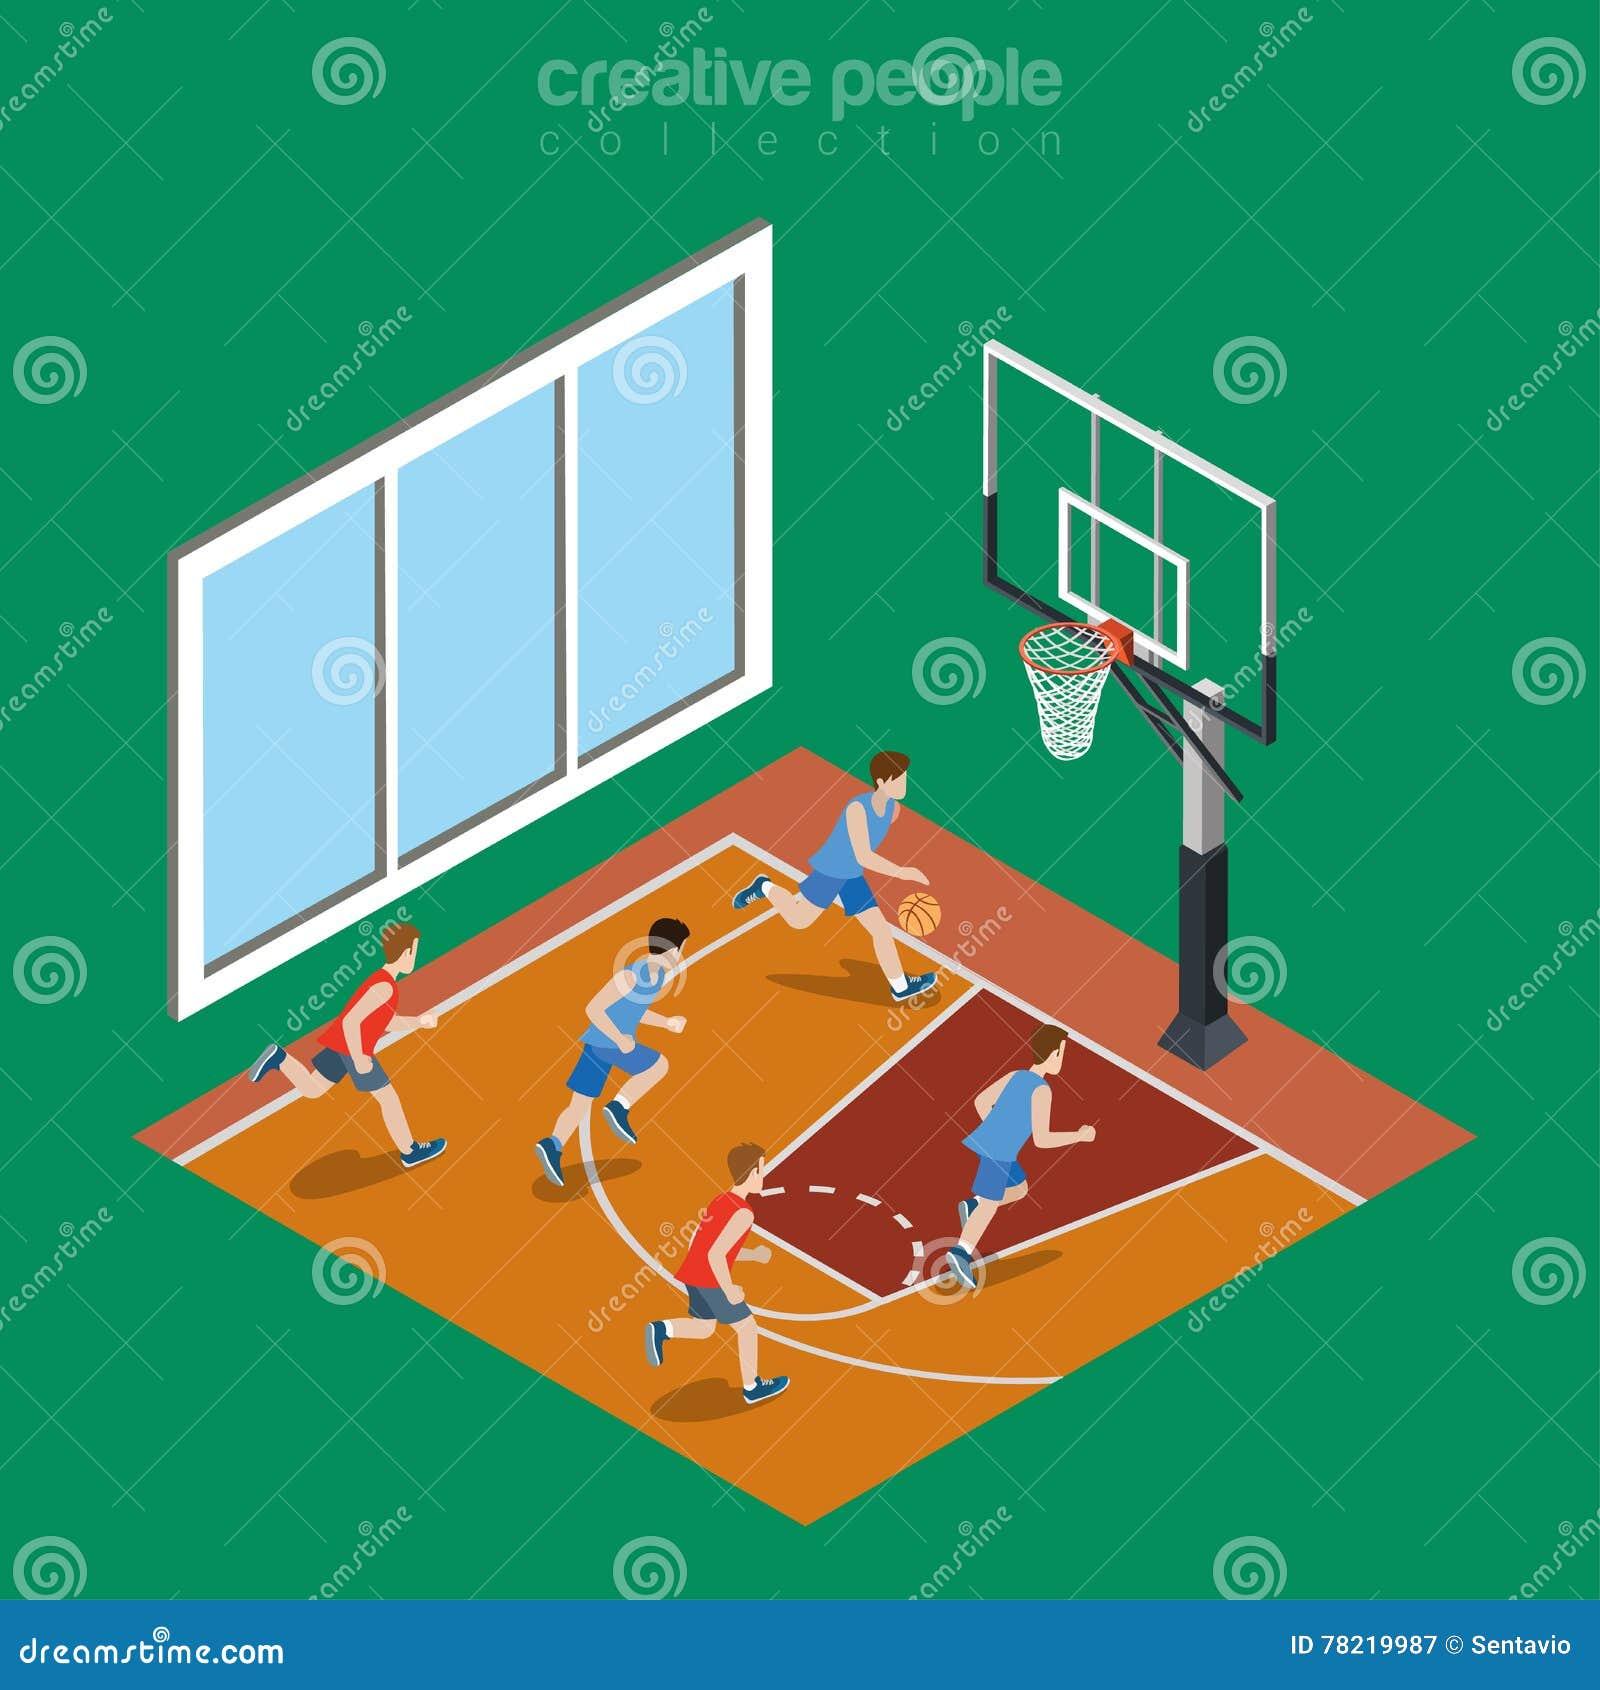 Isometric Flat Indoor Basketball Court Playground Stock Vector ...